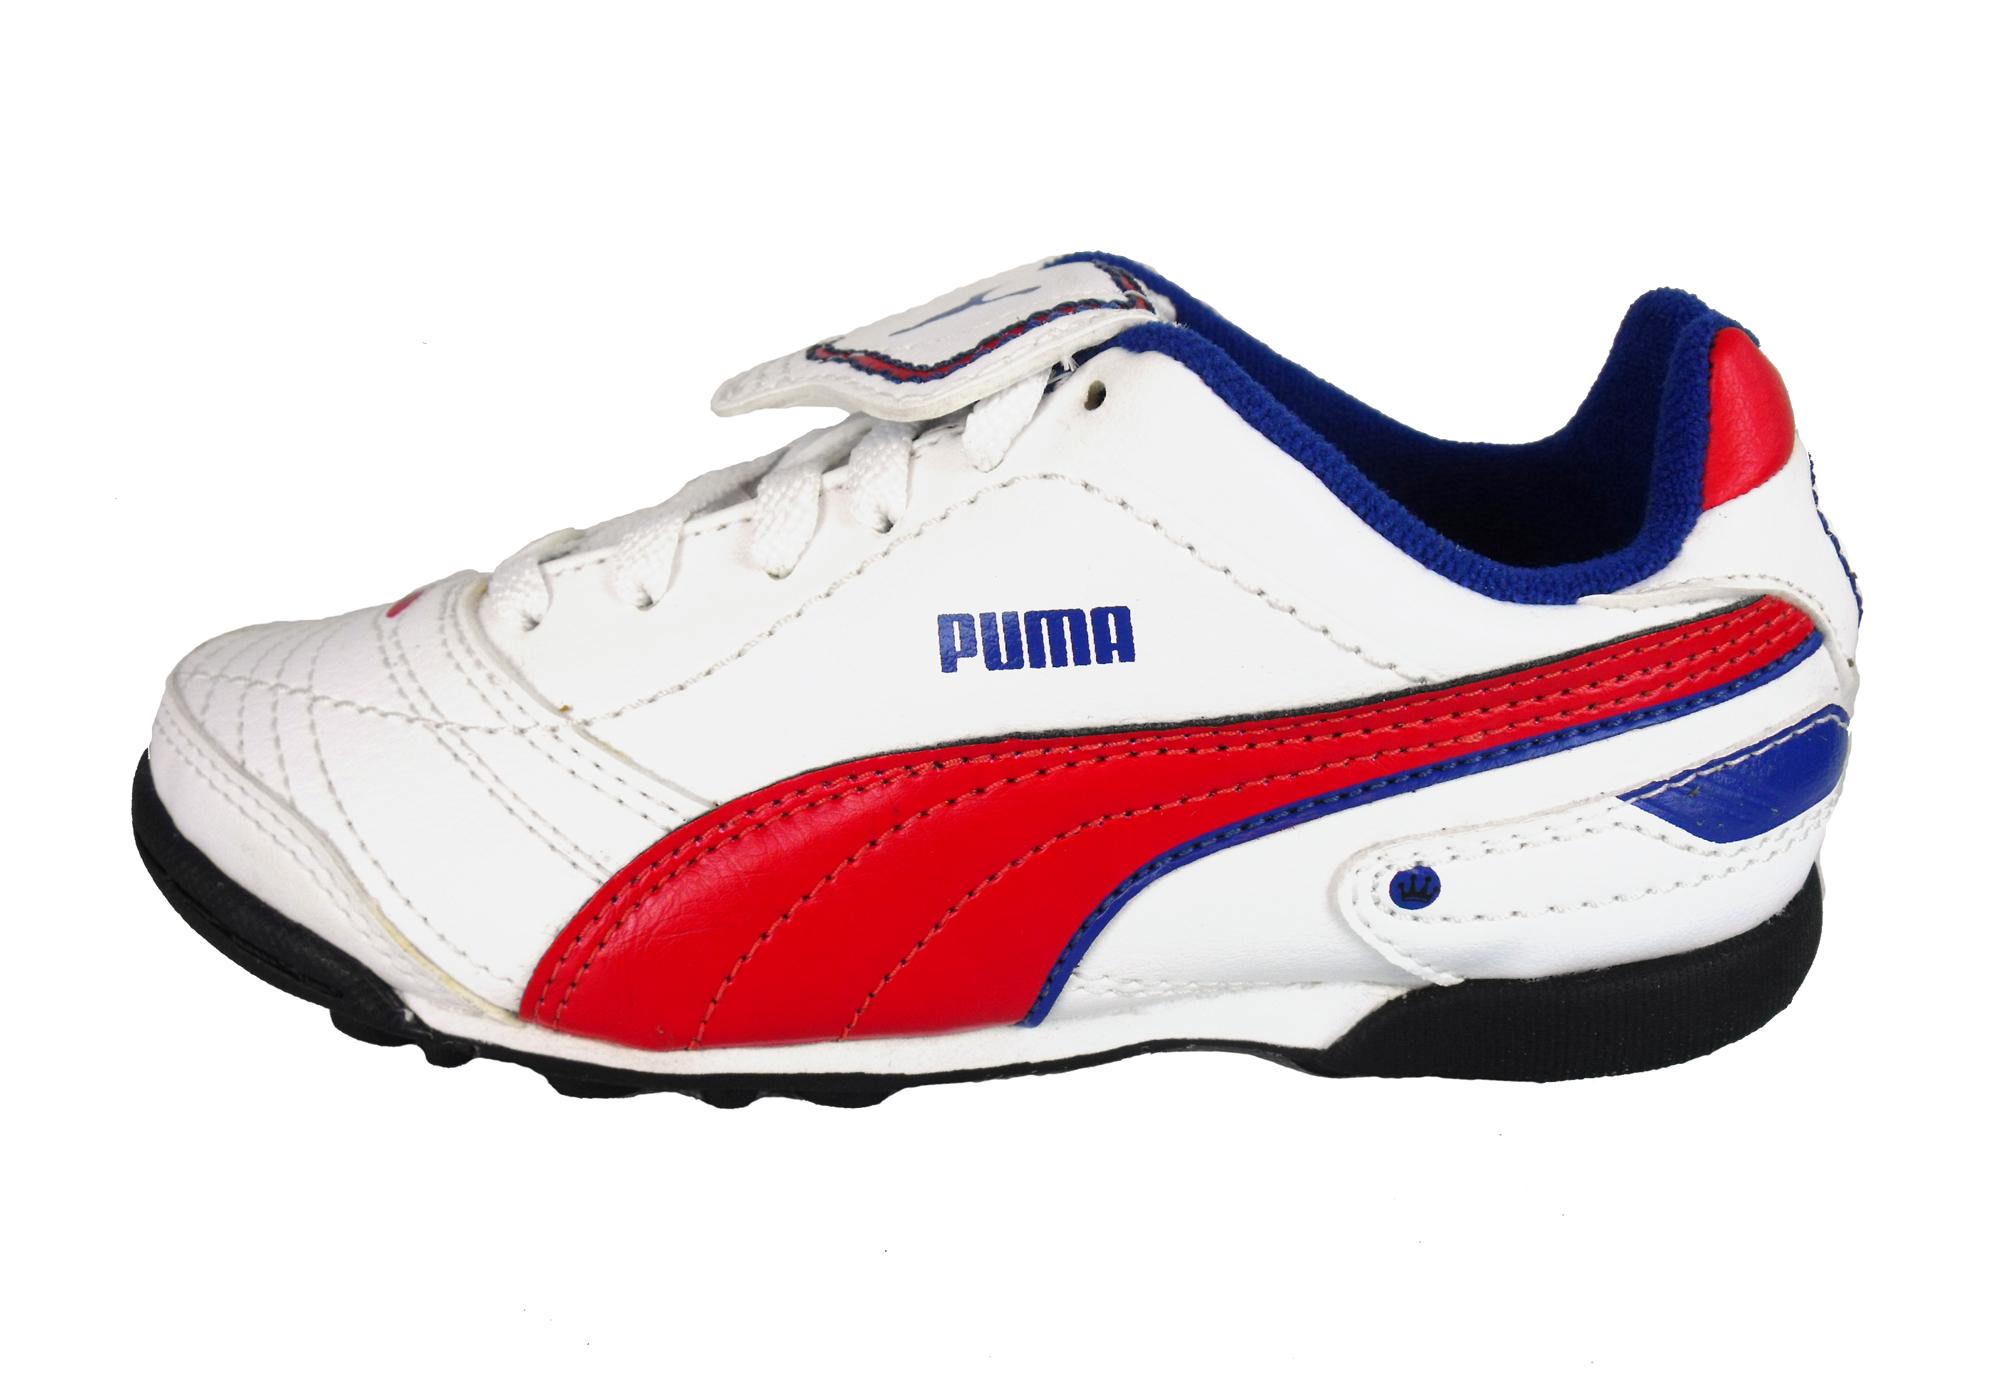 993ee8cf9bd944 Boys Puma Football Astro Turf TT Trainer Esito Finale Soccer Trainers  Astros New